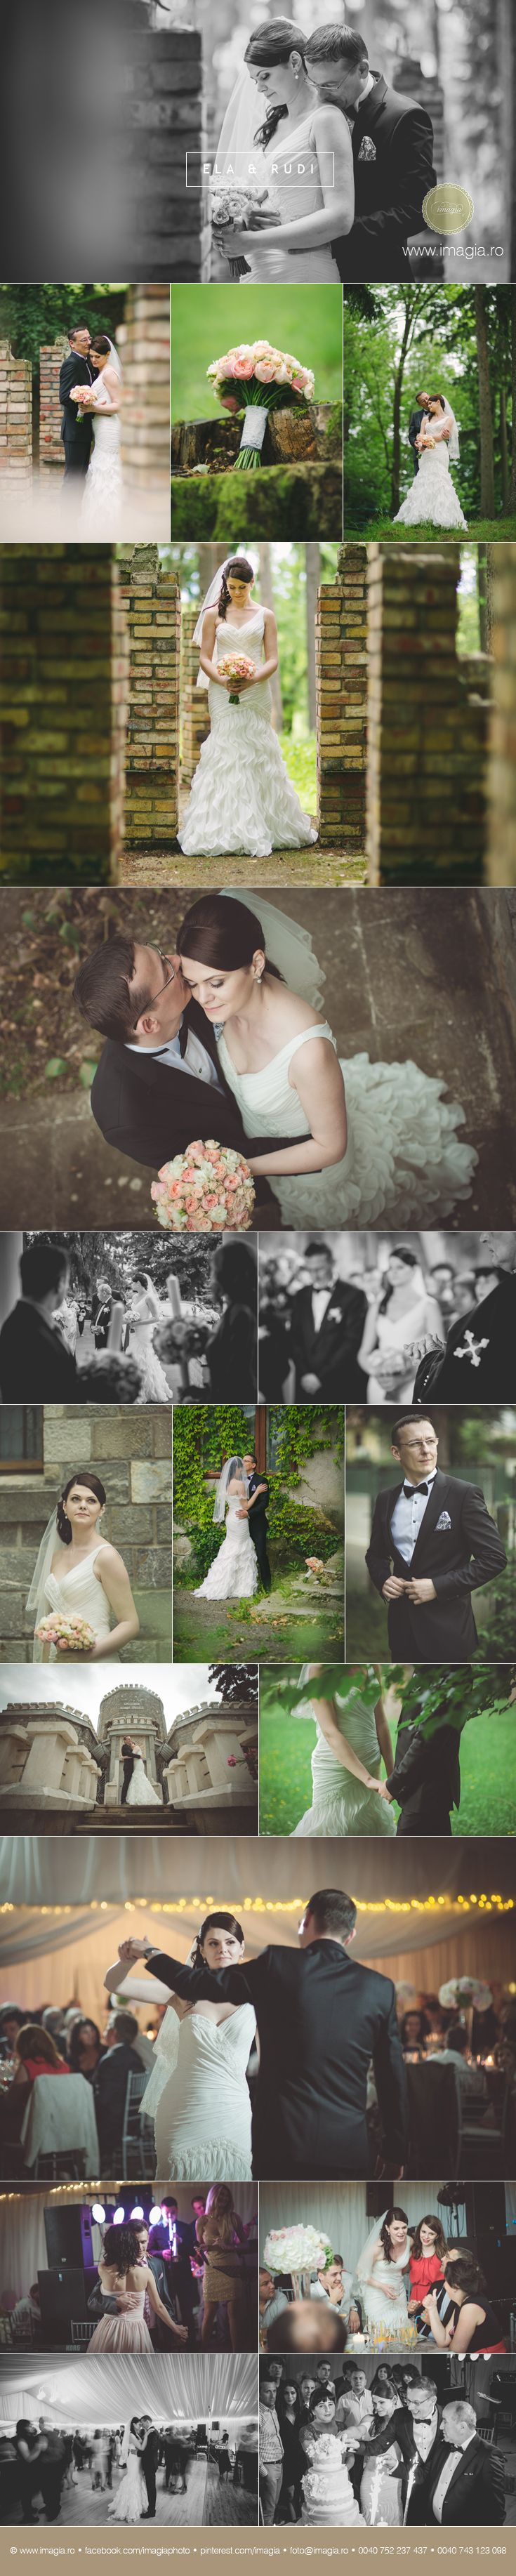 Wedding photos from Campina, Romania - you can find the details here:  http://www.imagia.ro/blogpage/fotografie-de-nunta-in-campina-cu-ela-si-rudi-  © imagia | www.imagia.ro